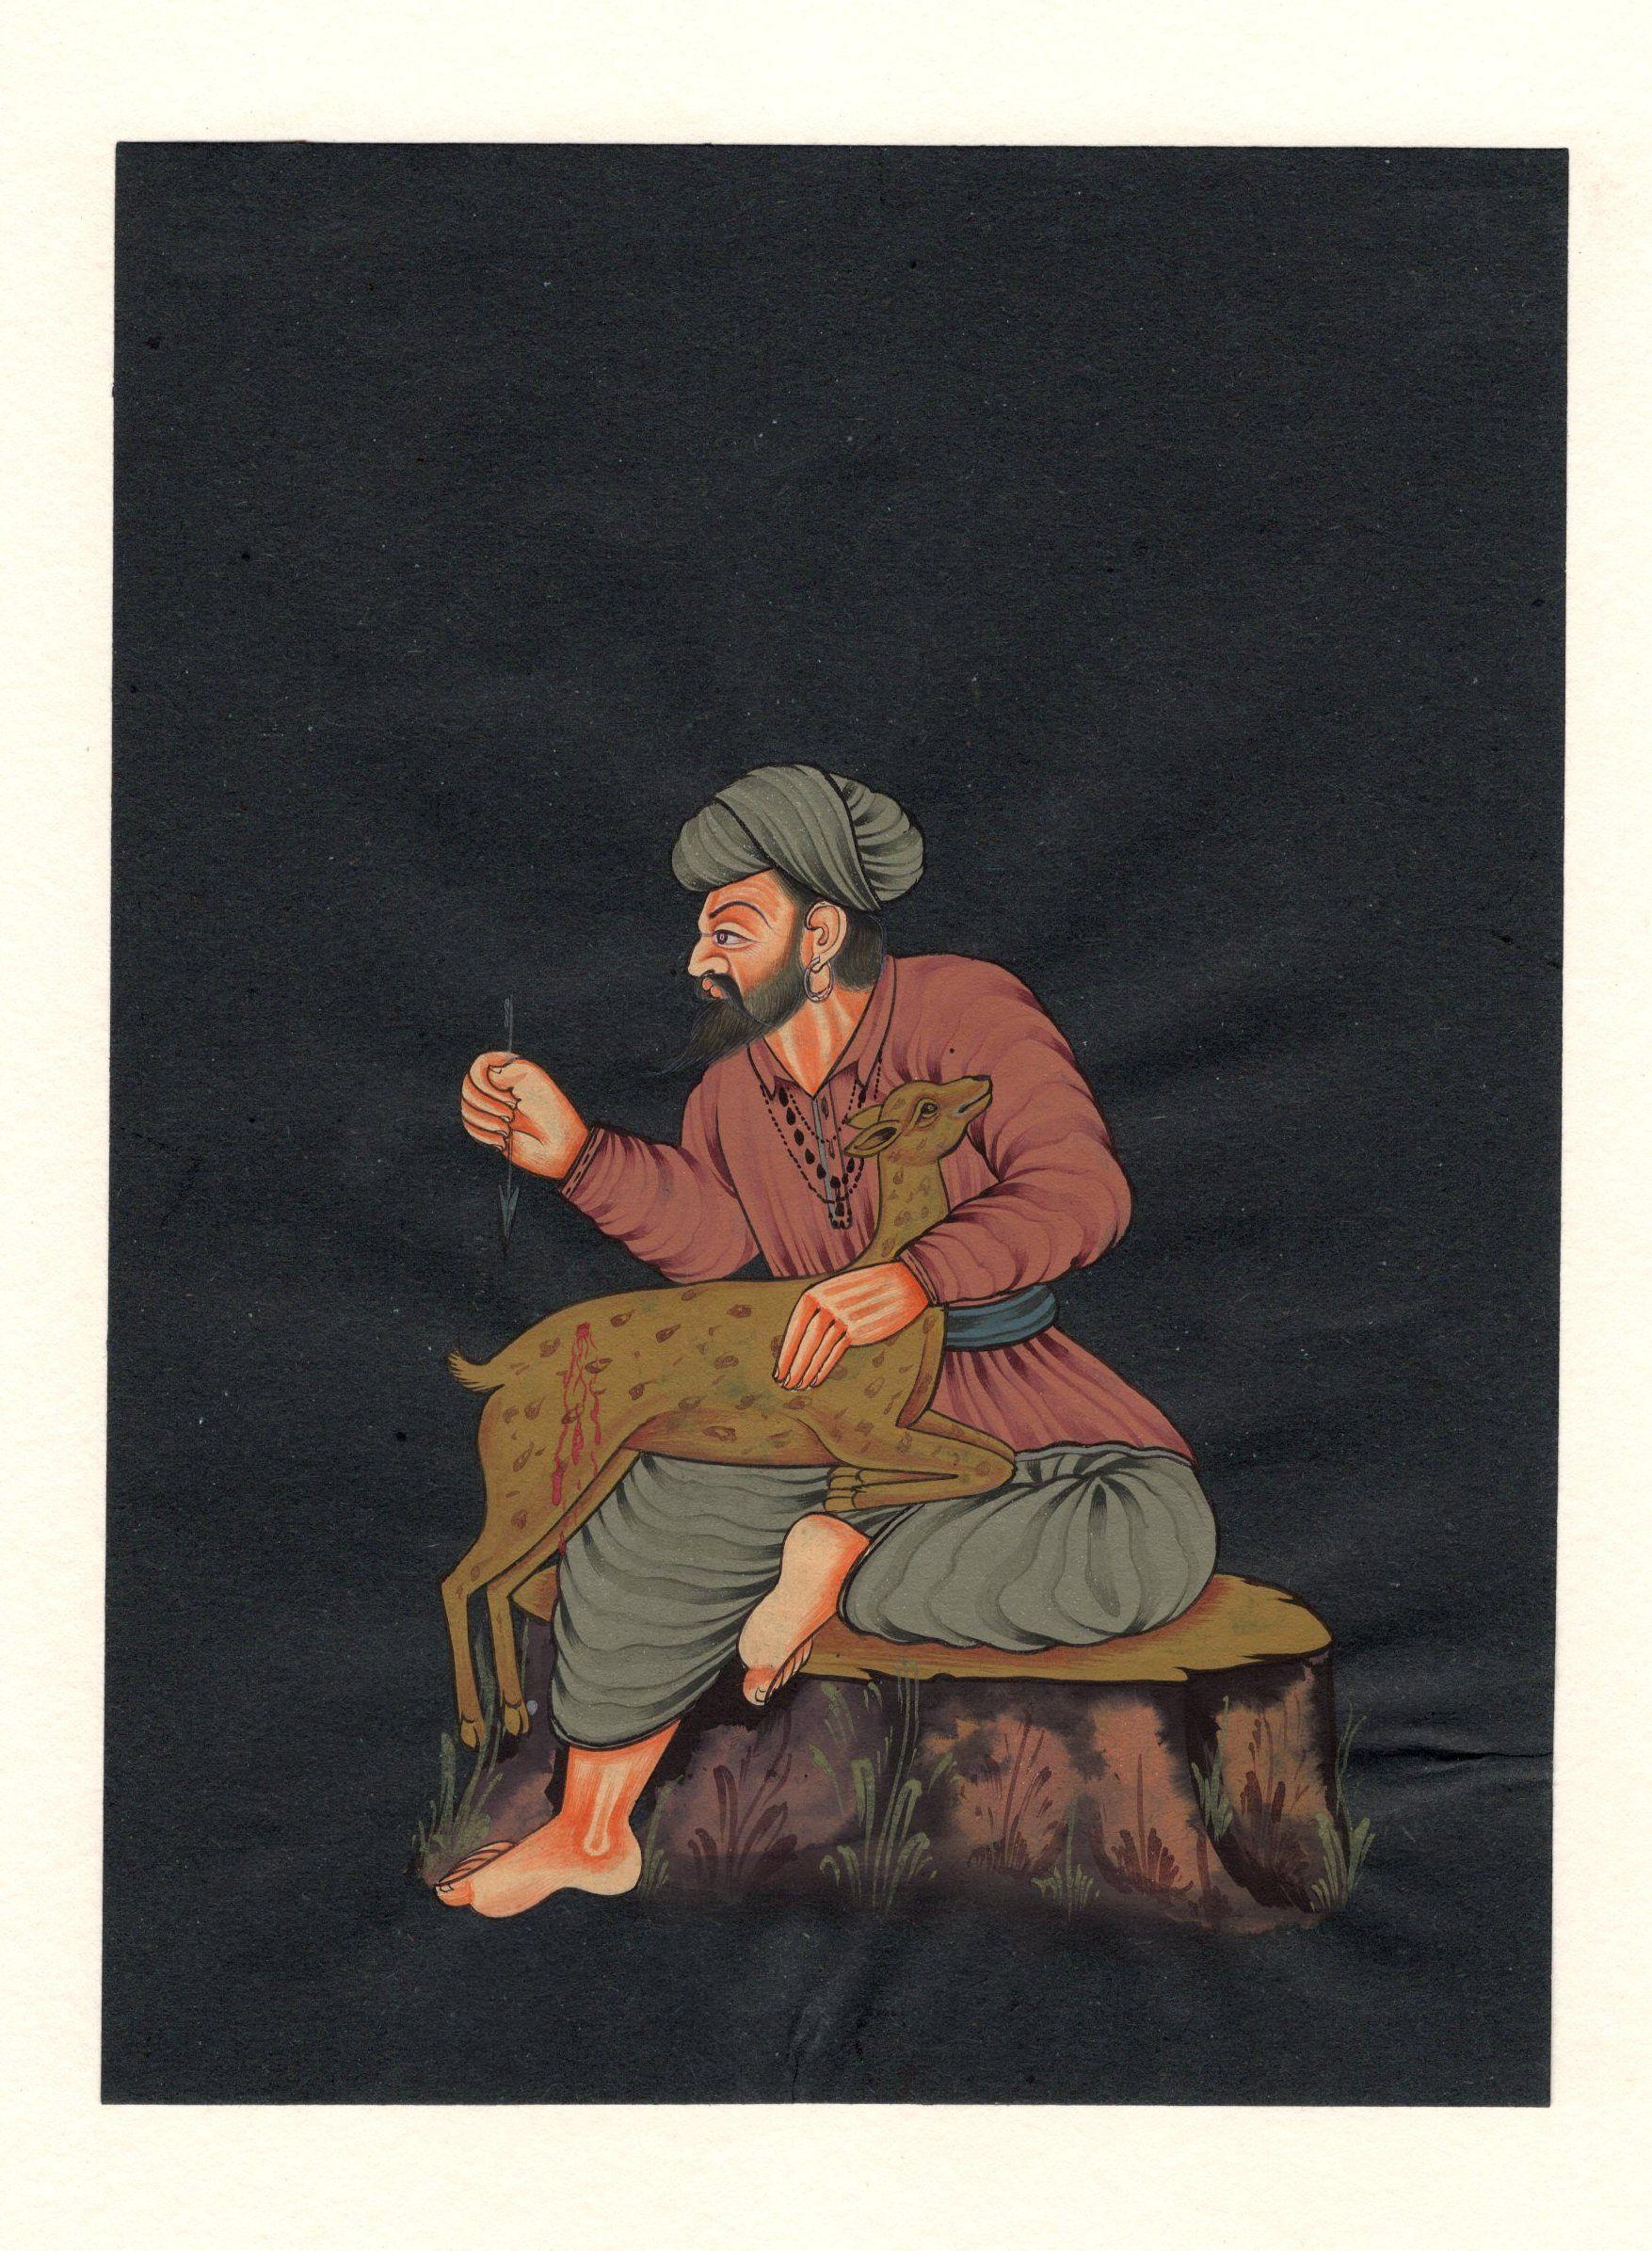 Rajasthani Villager Folk Art Handmade Indian Miniature Portrait Ethnic Painting